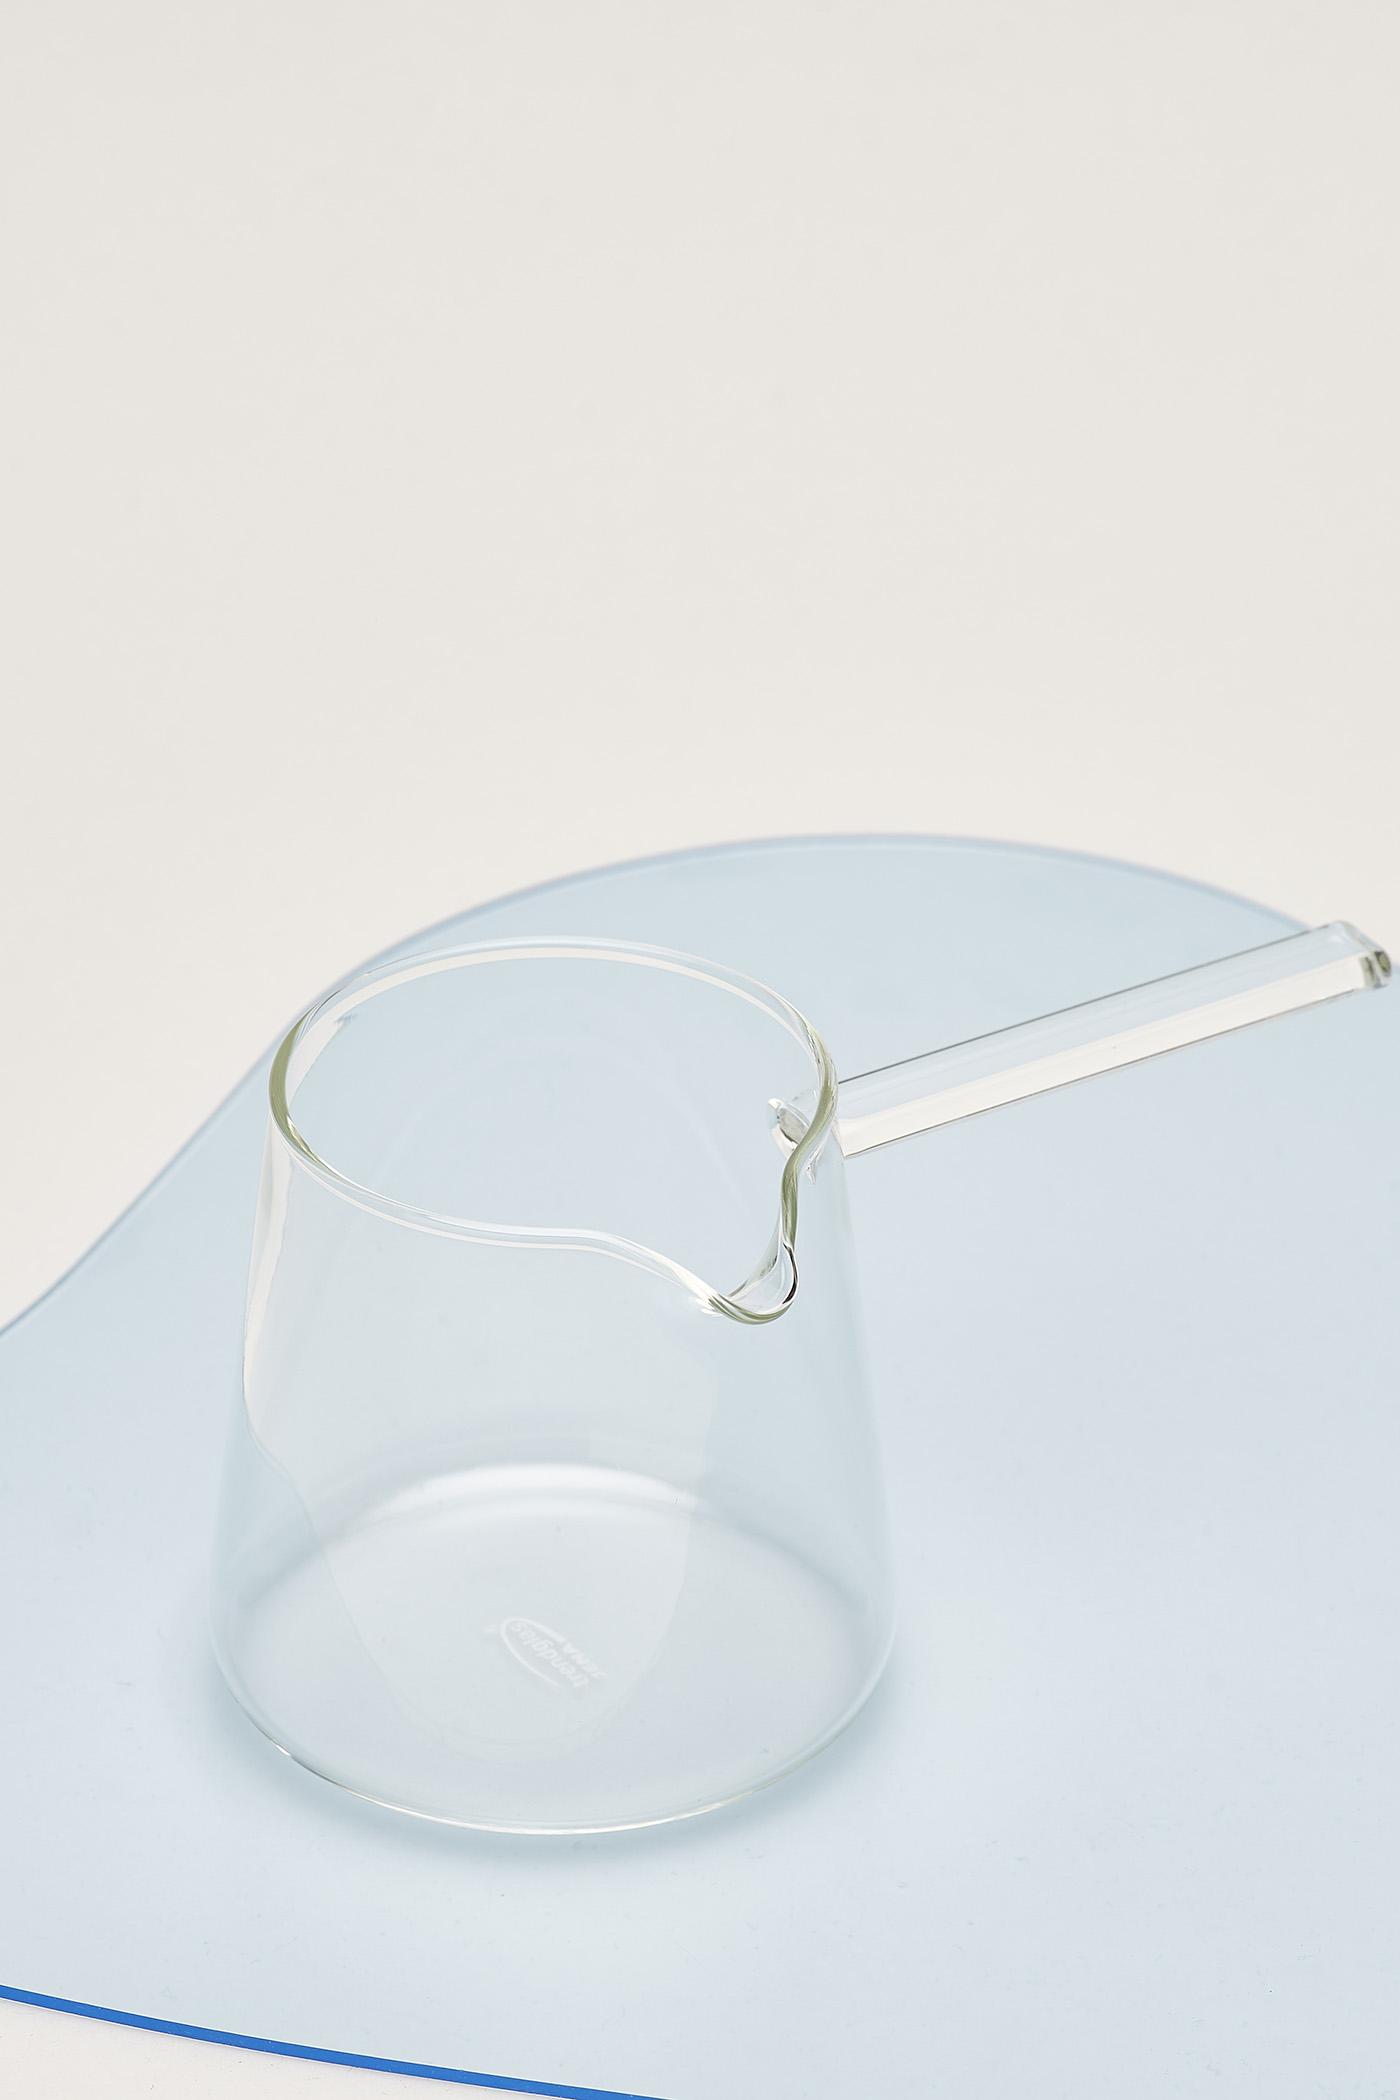 Trendglas Ibrik Coffeepot